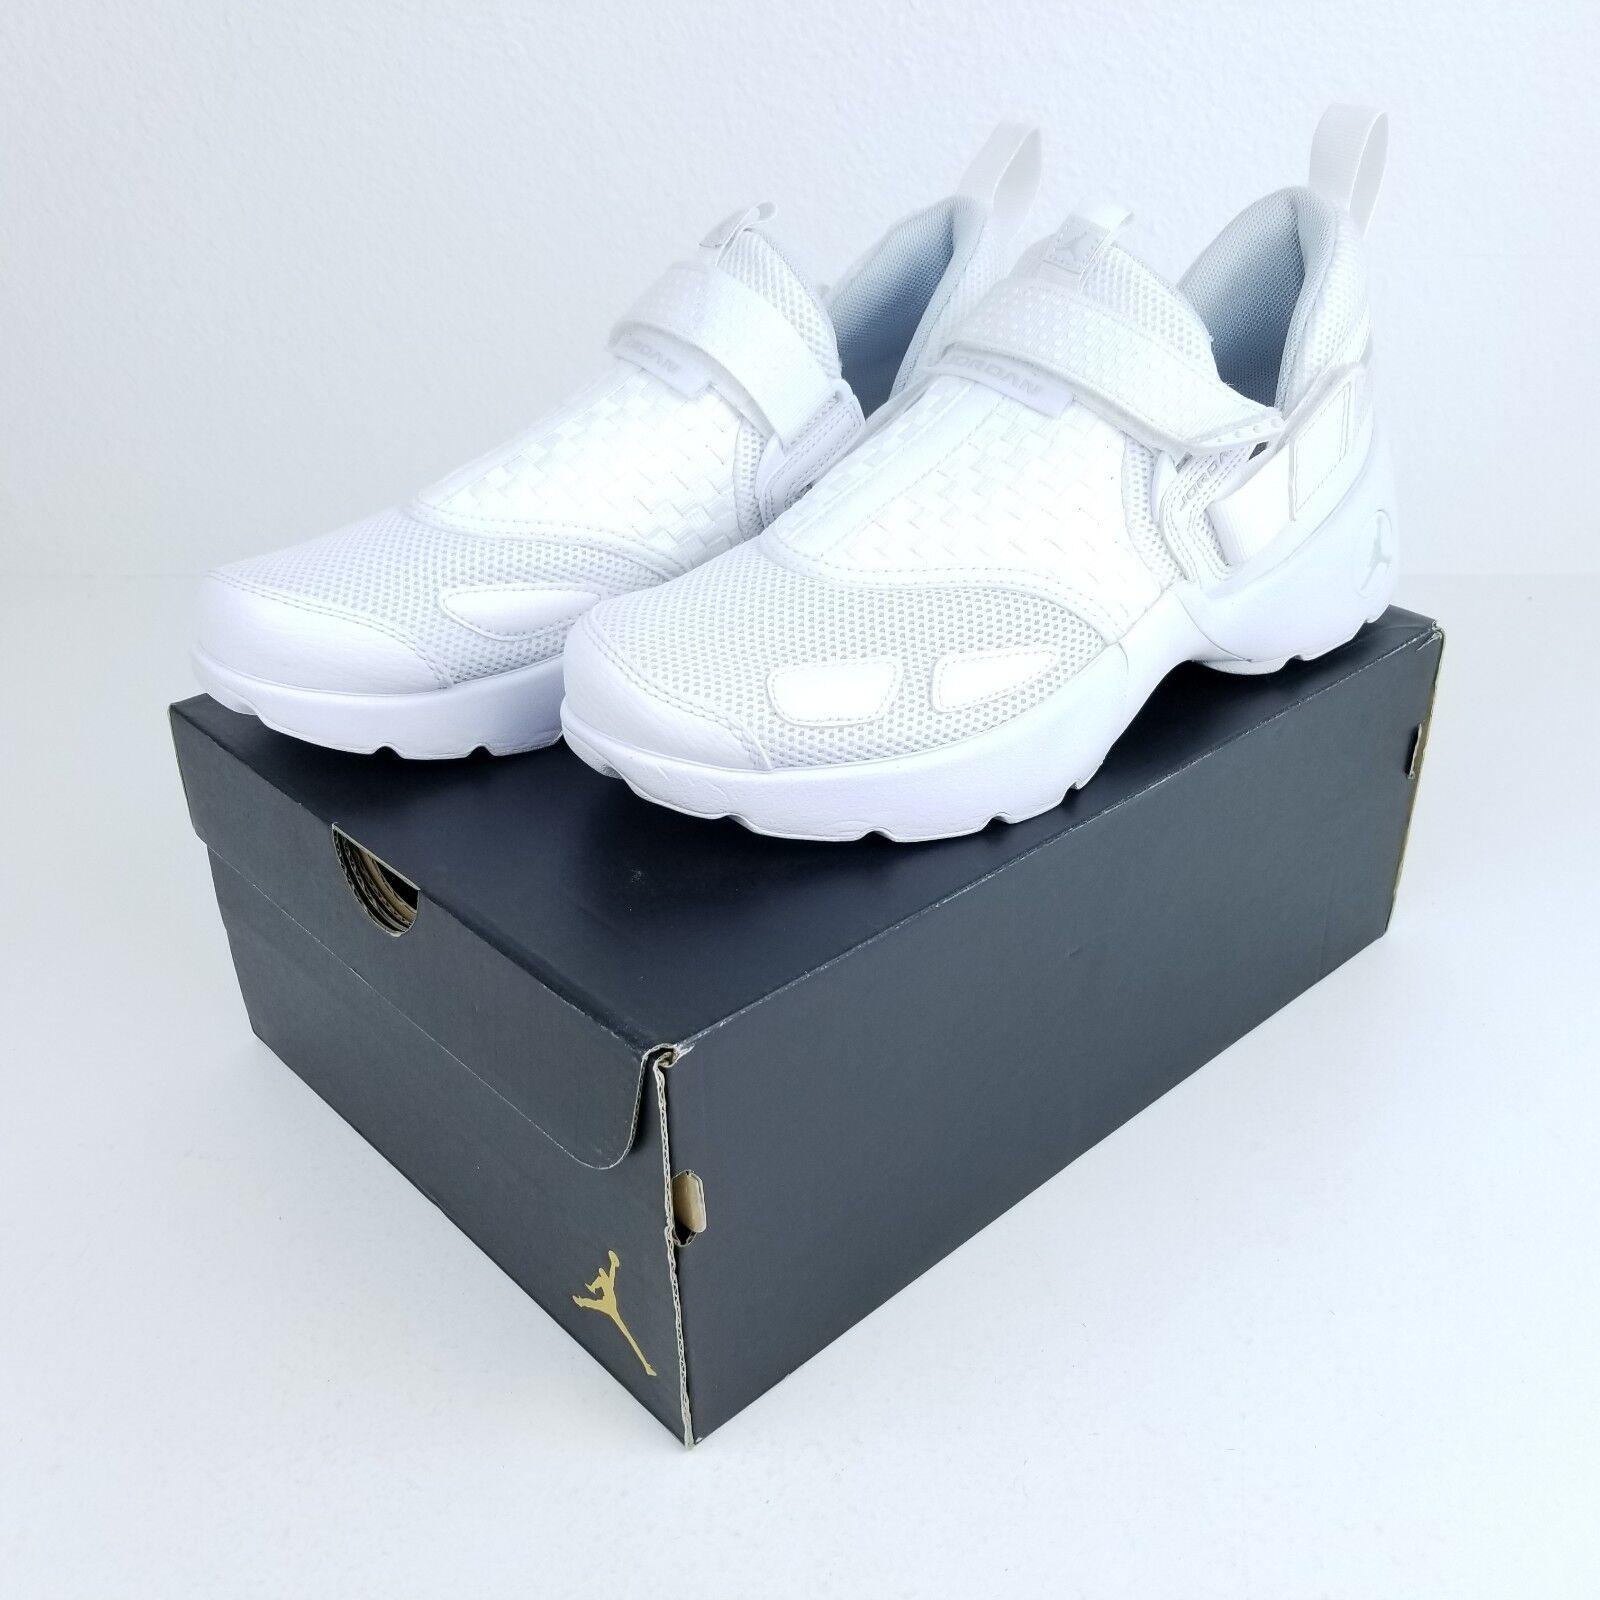 Nike Air Jordan Trunner LX Triple White Pure Platinum  140 MSRP 897992 100 Sz